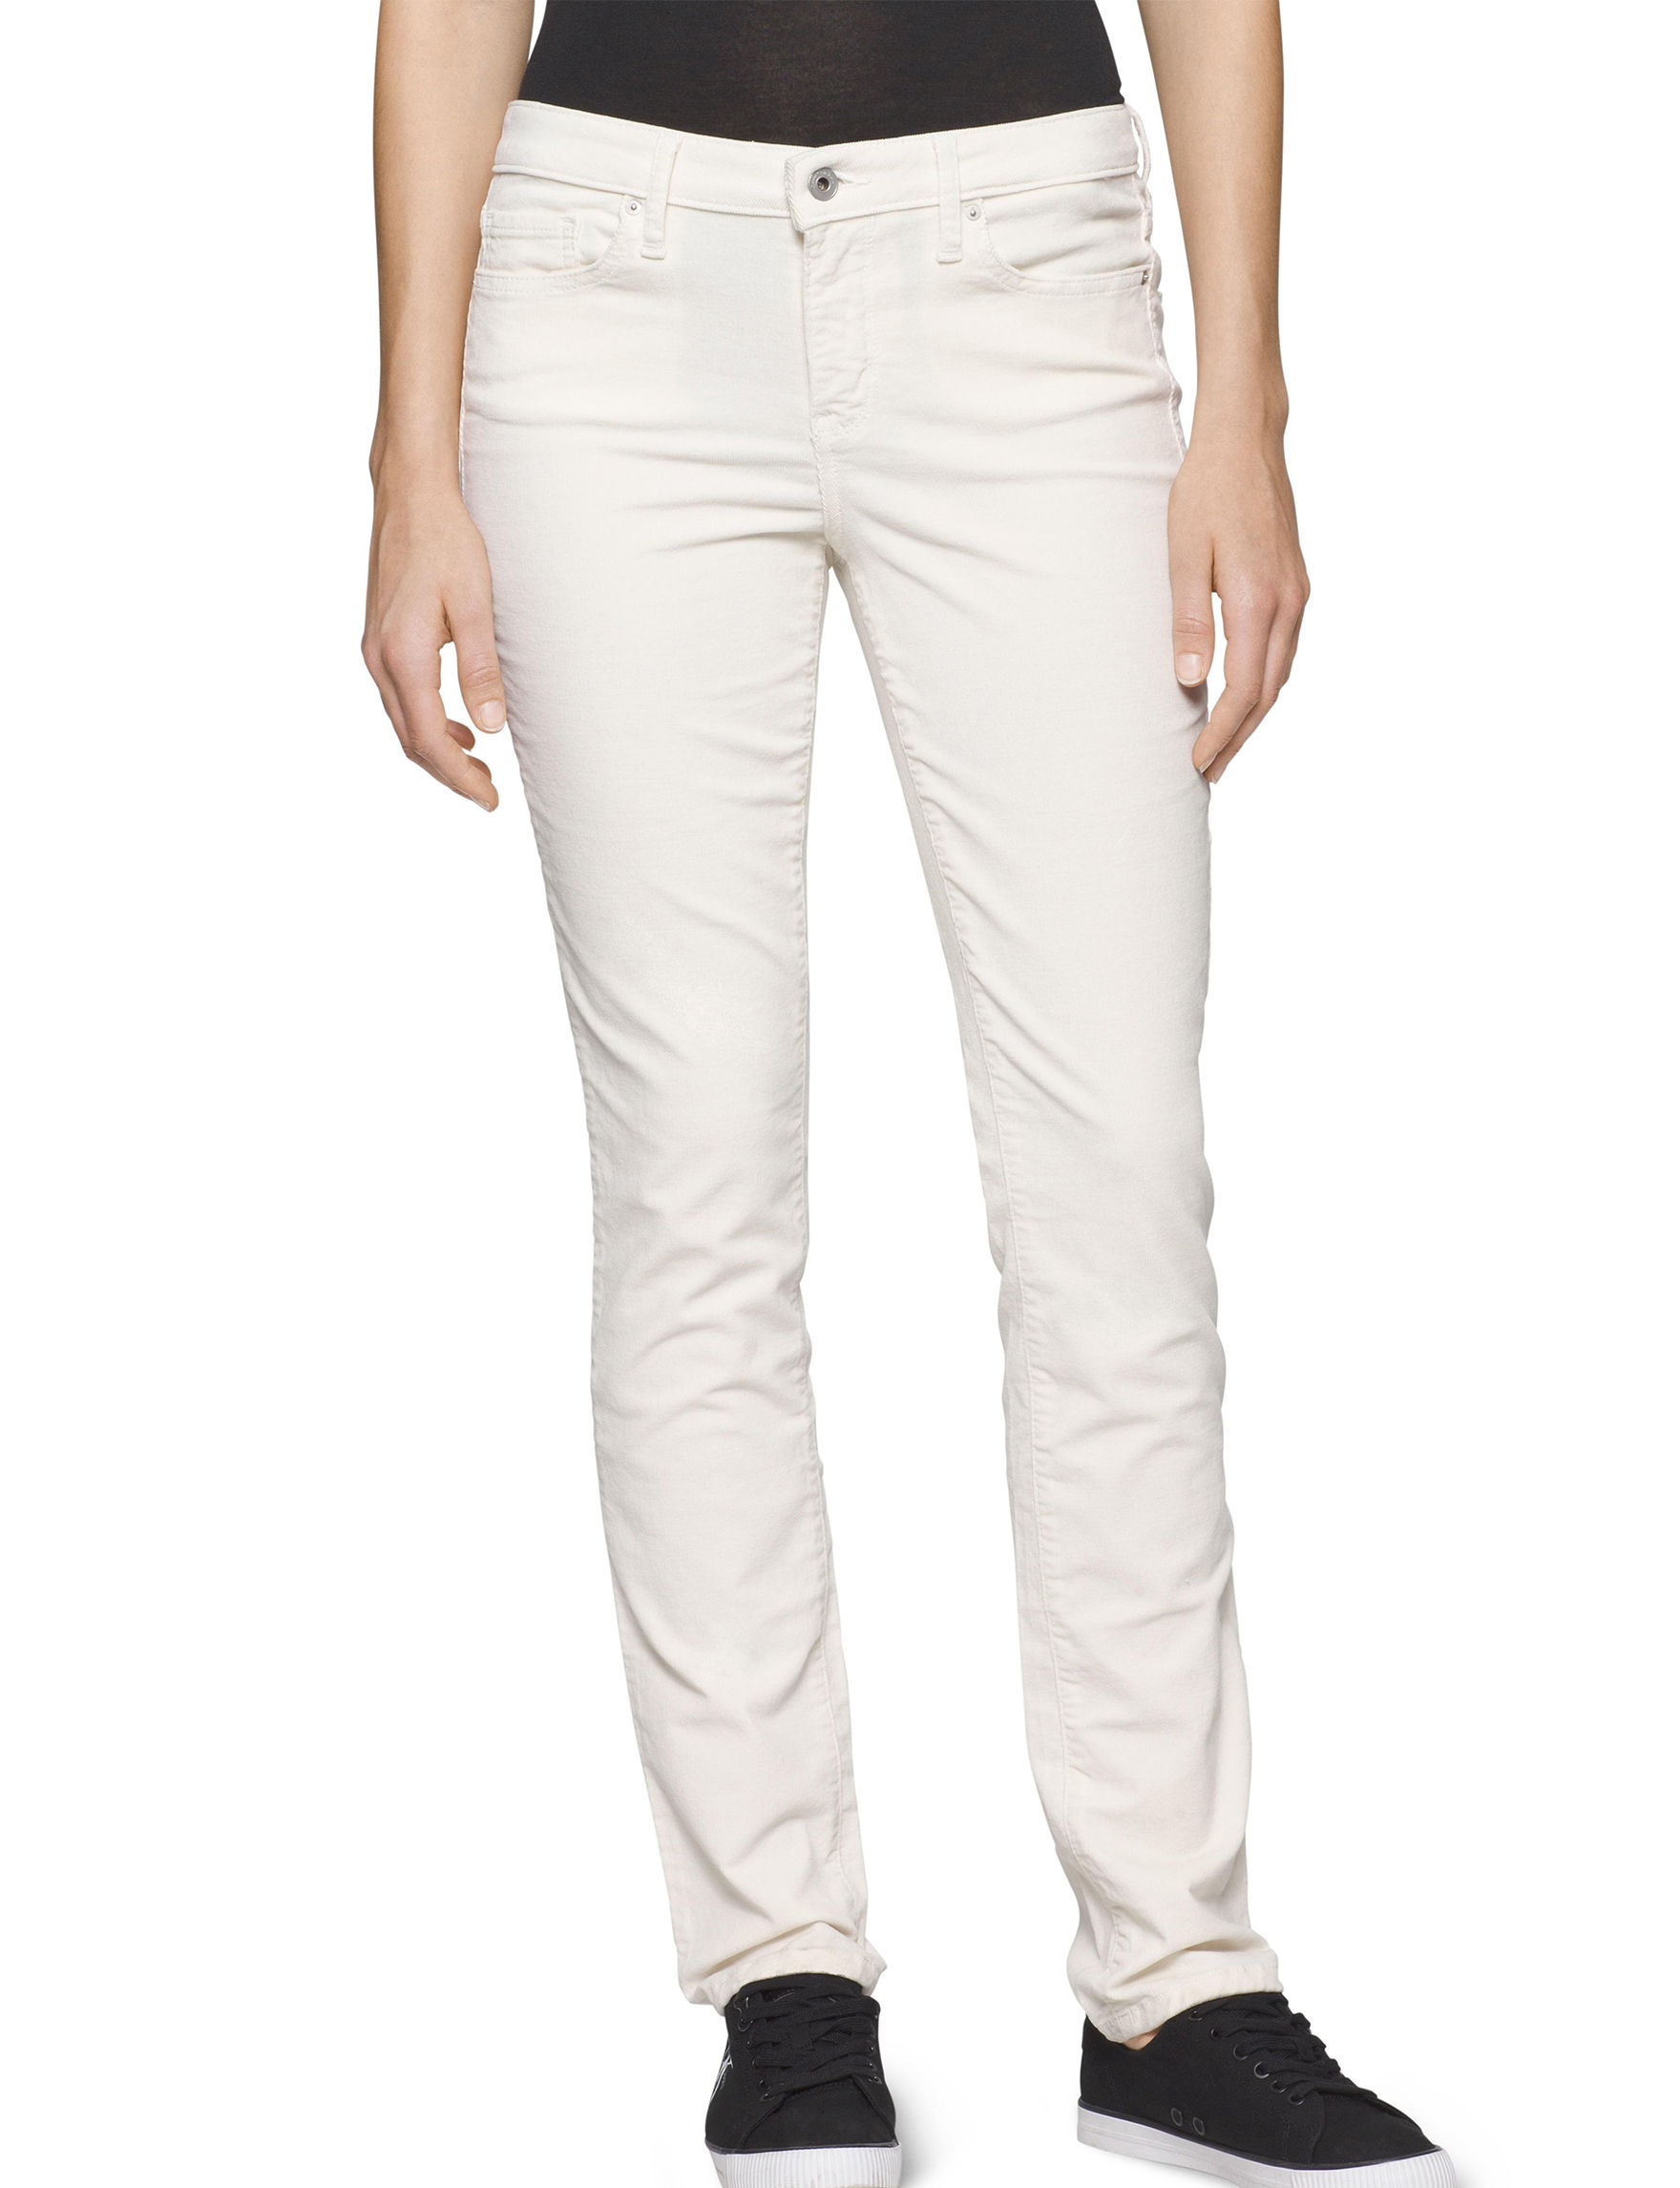 Calvin Klein Jeans Off White Soft Pants